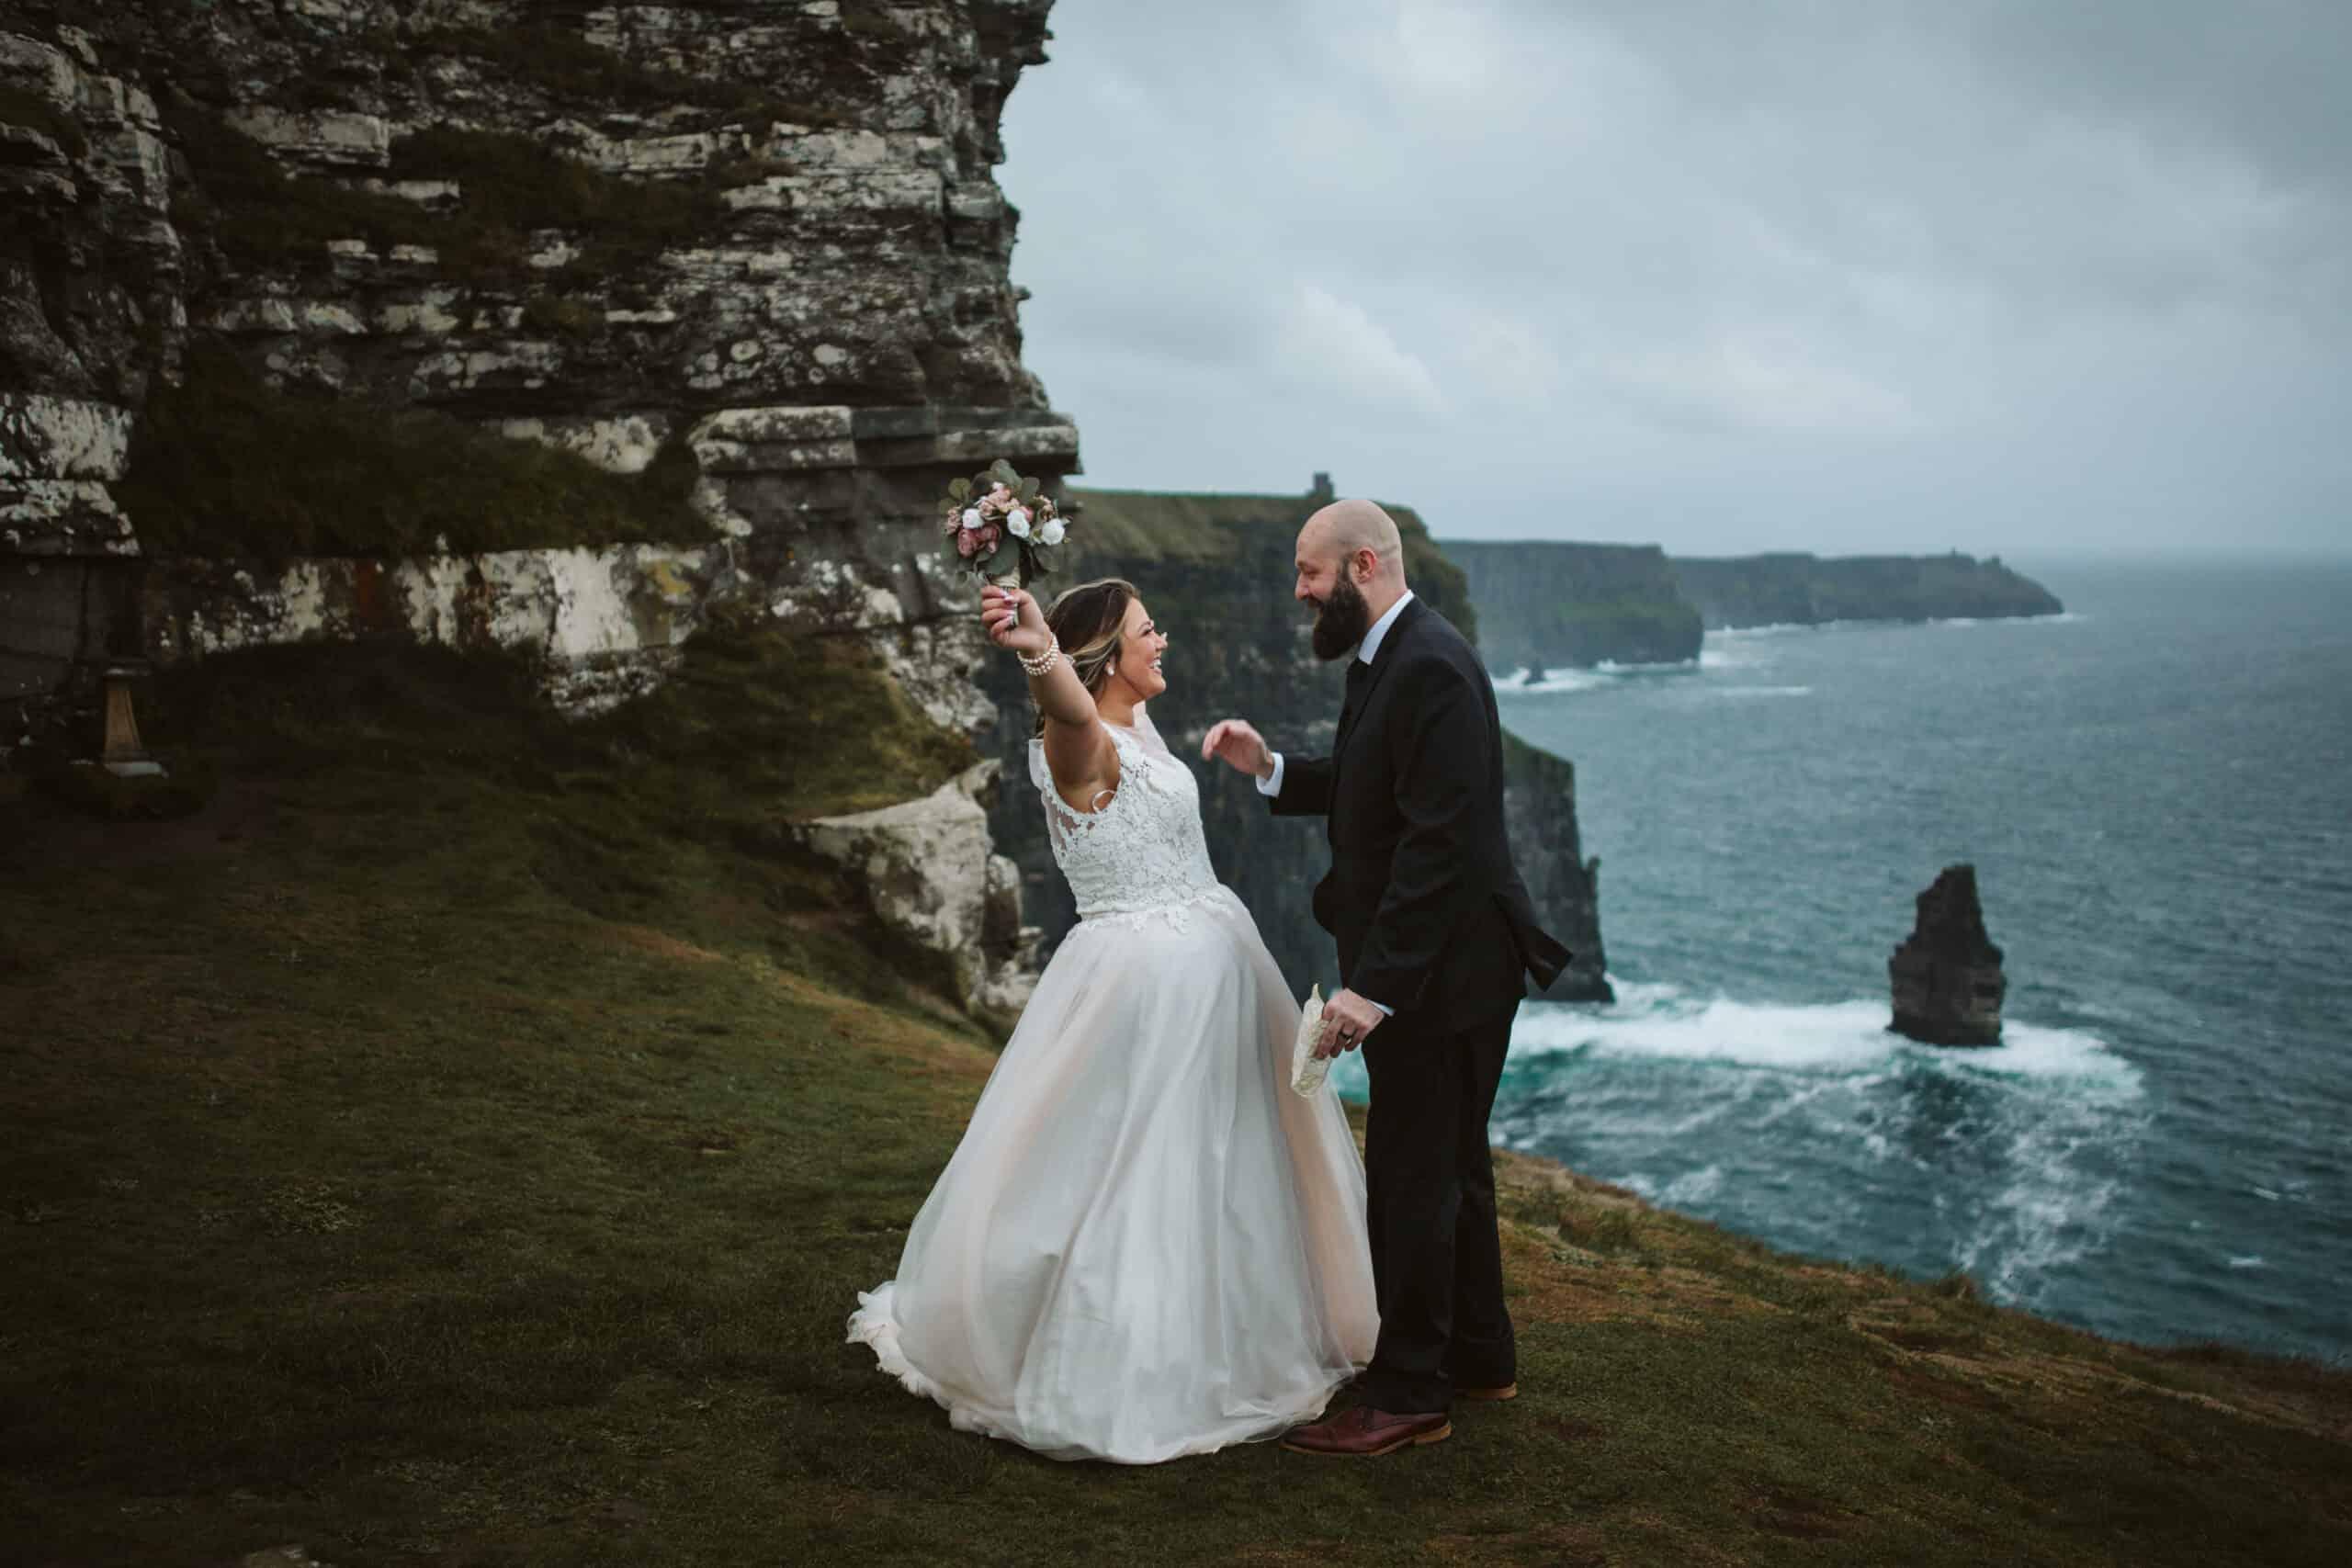 Cliffs of Moher Wedding Hags head, bride and groom cheer